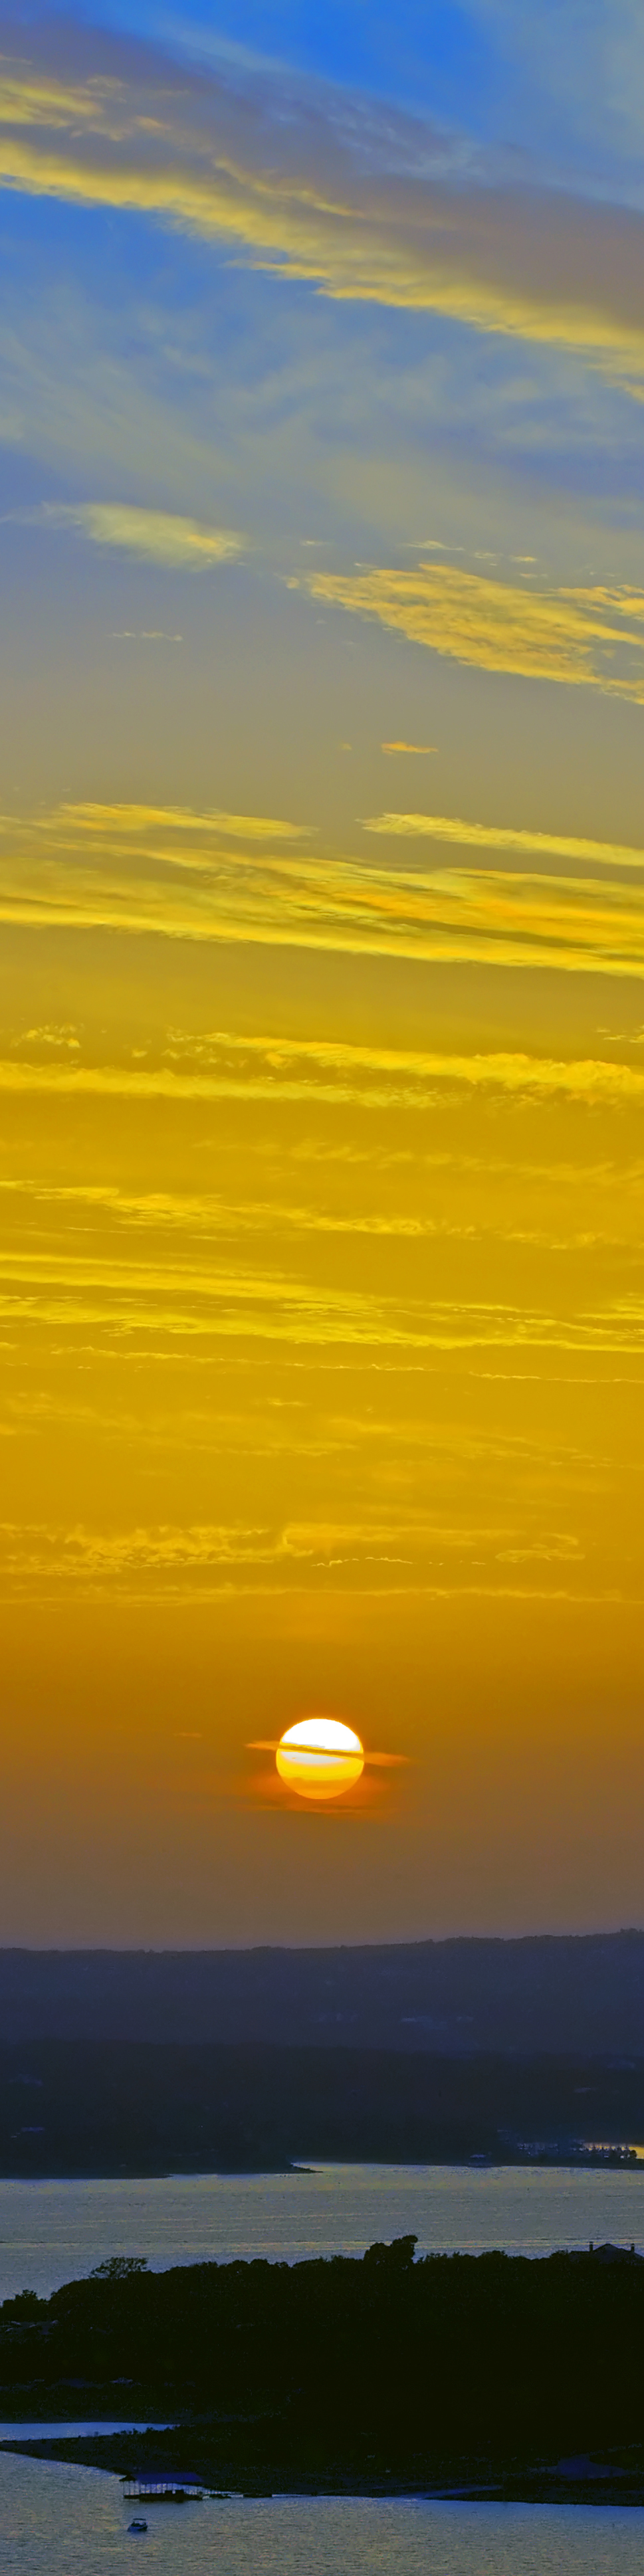 Sunset Blue & Gold No. 1